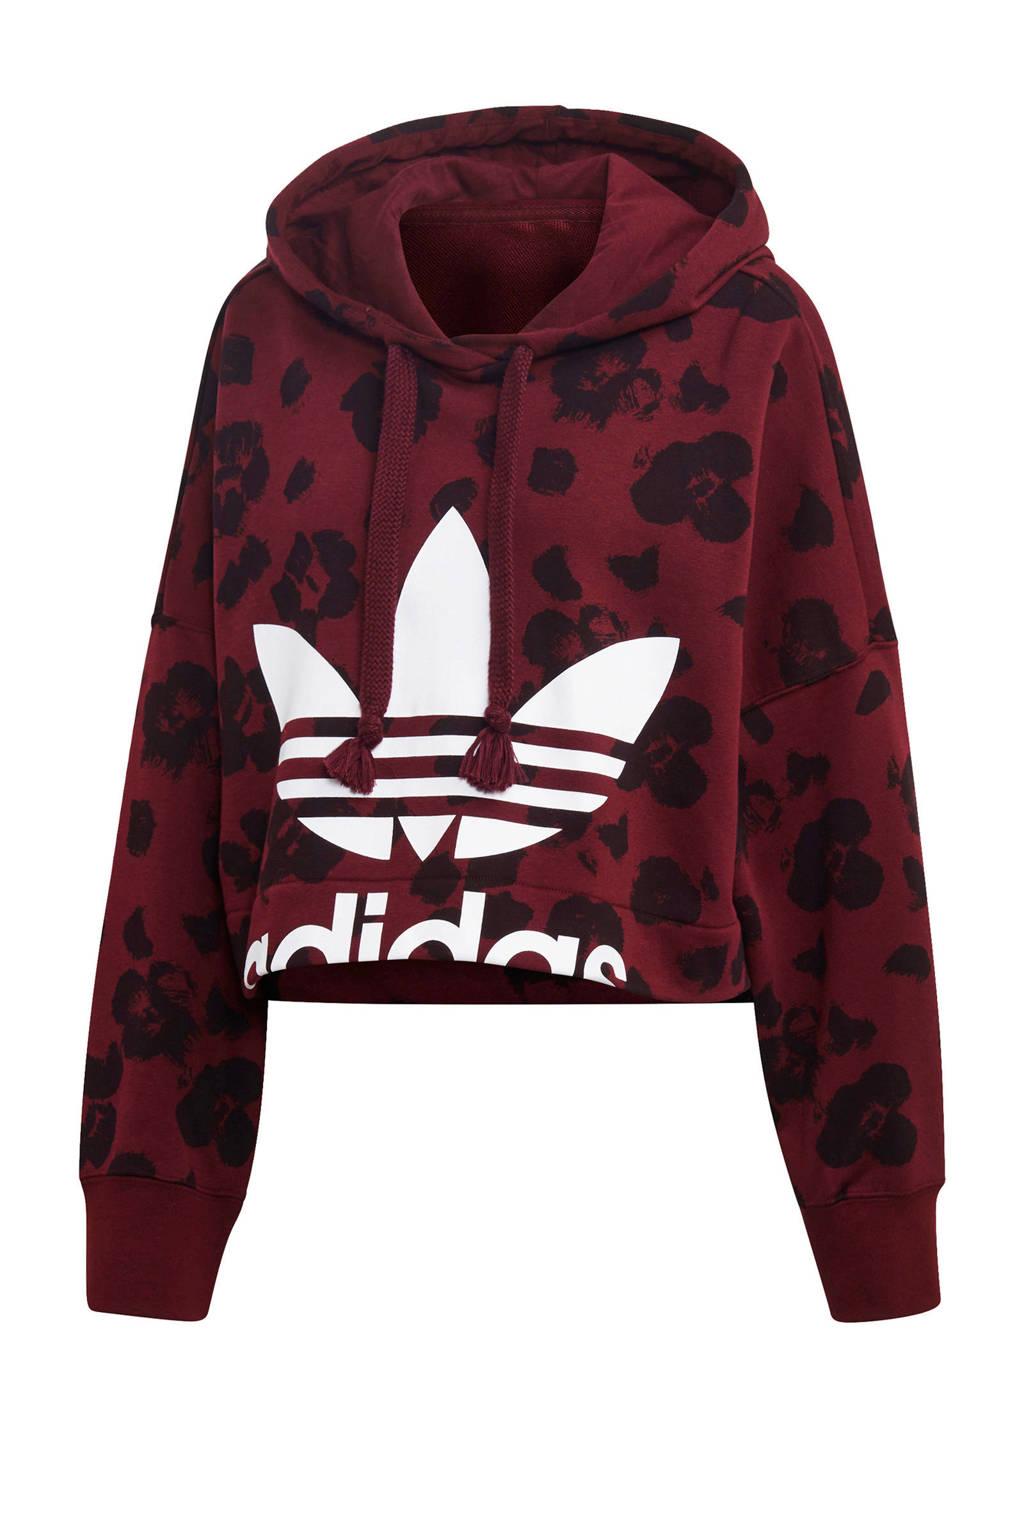 adidas originals cropped hoodie  donkerrood, Donkerrood/zwart/wit